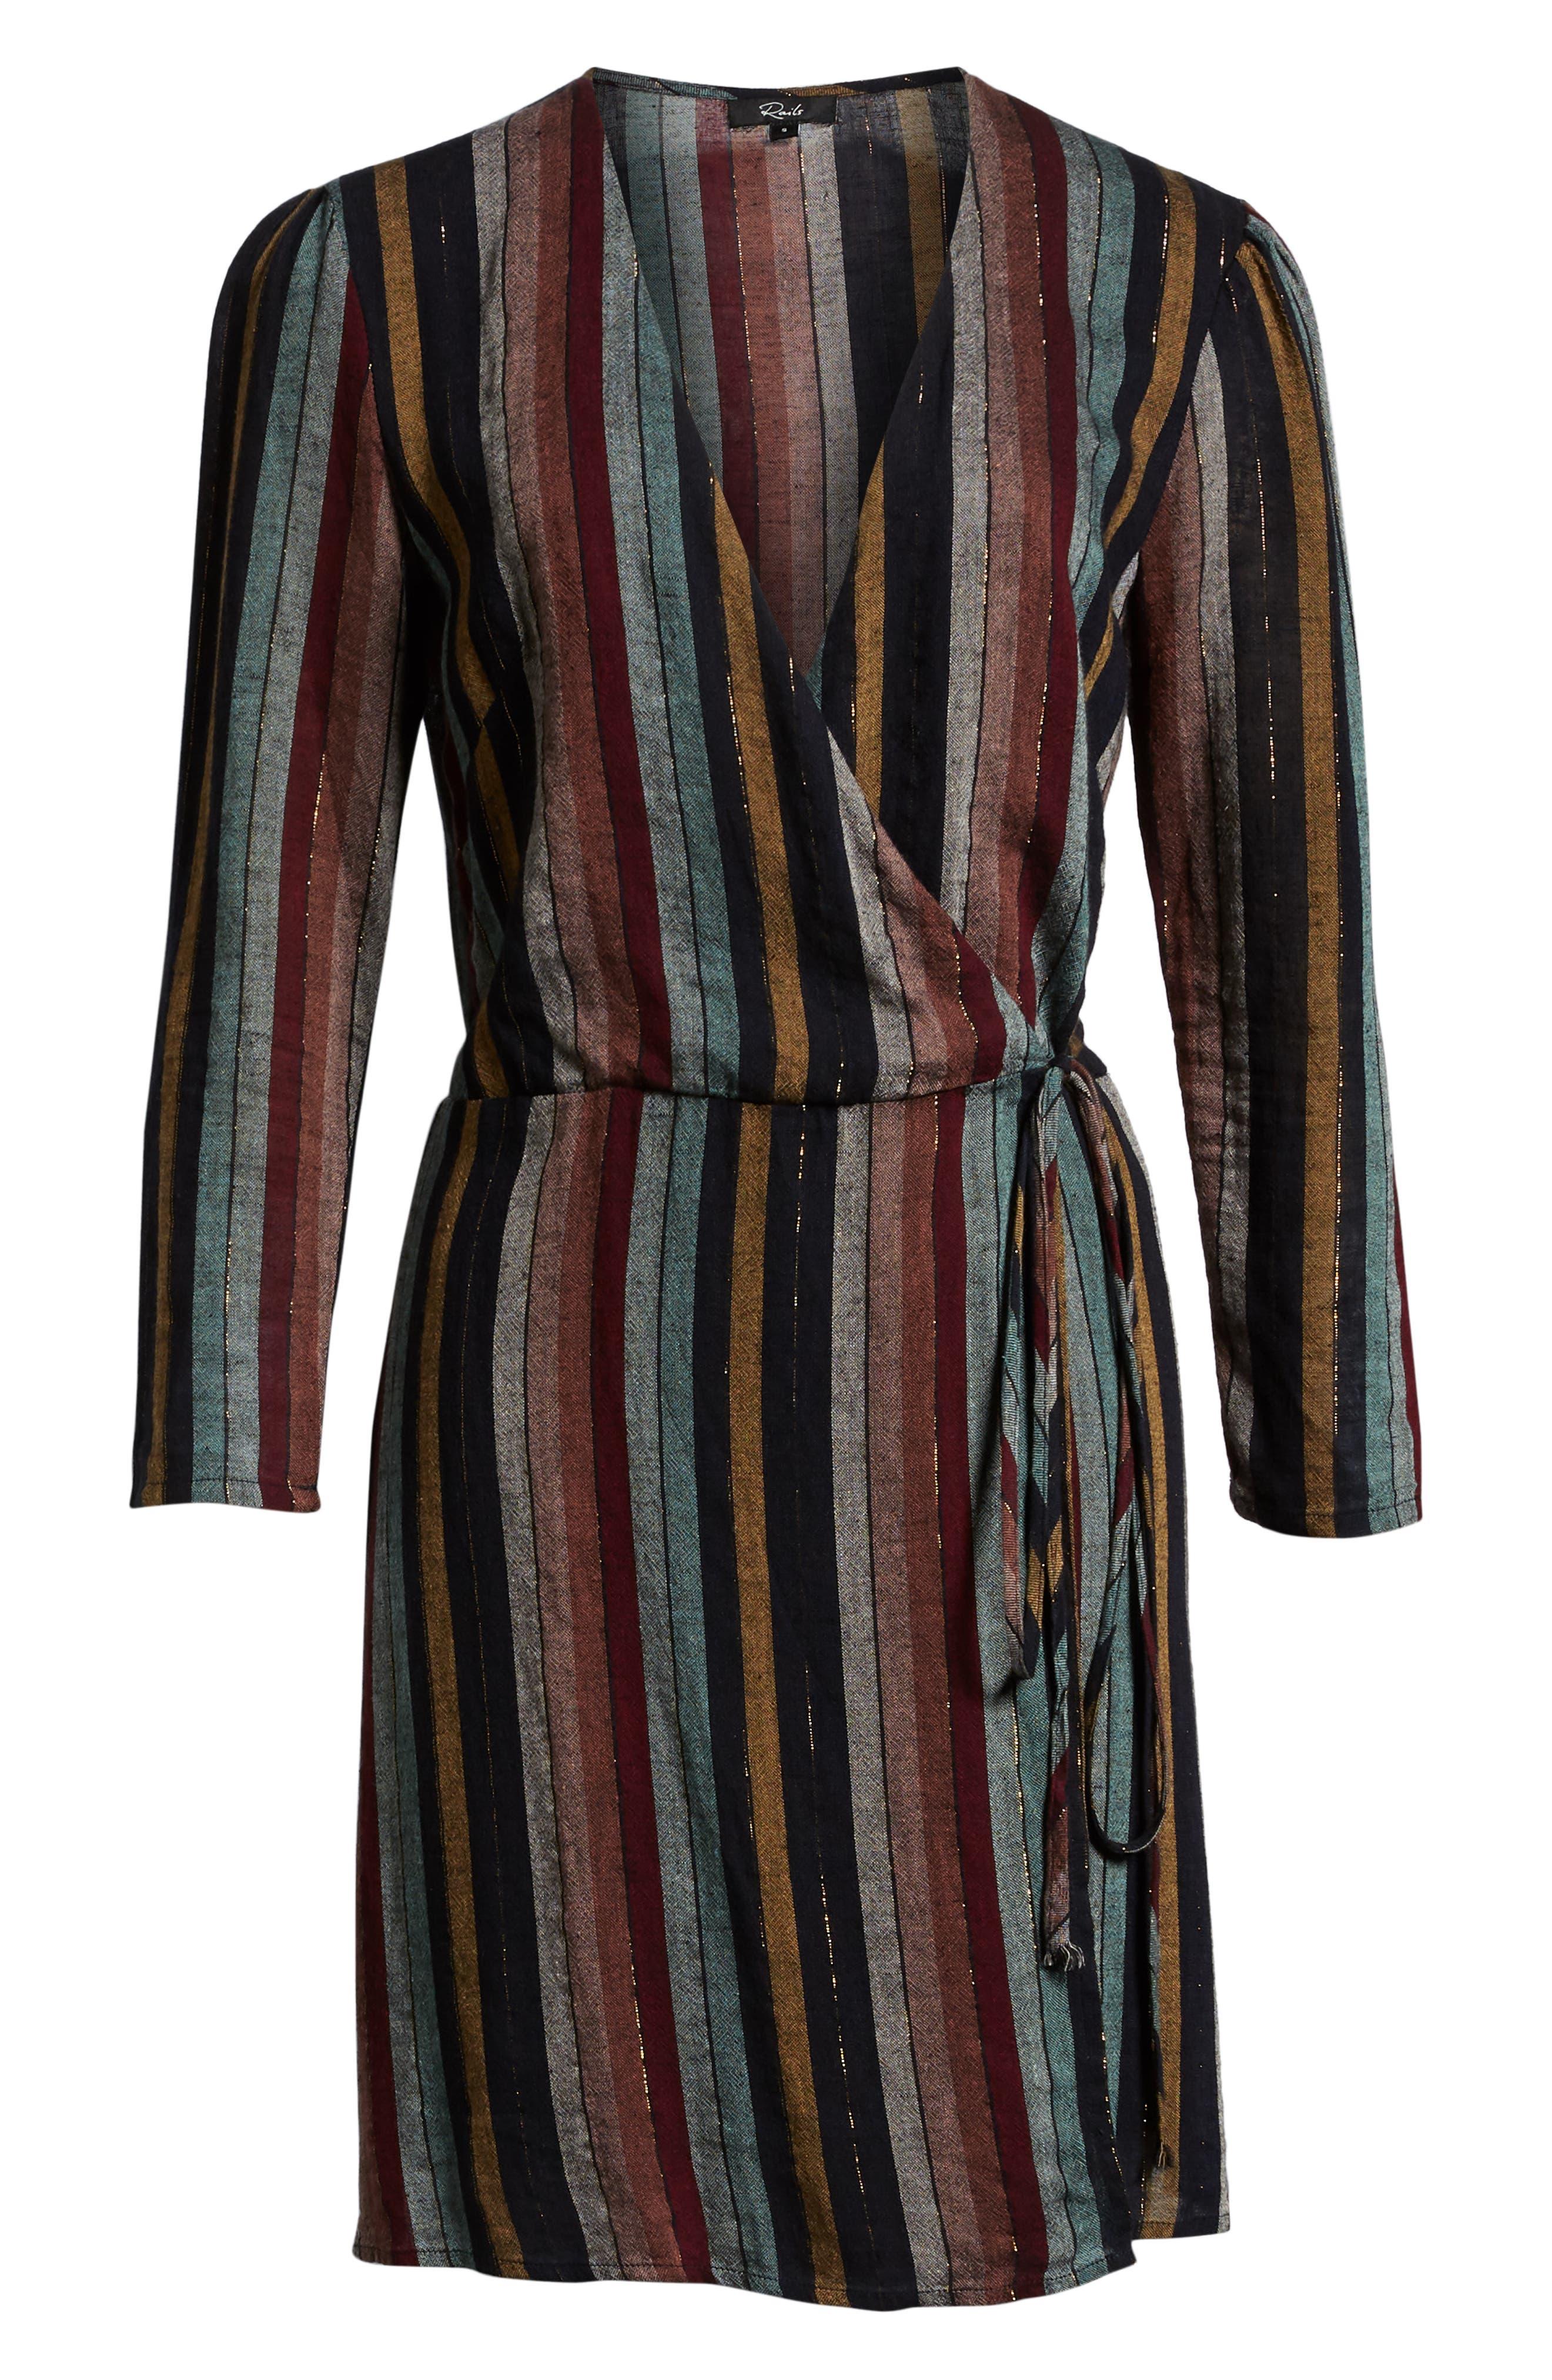 Lola Metallic Wrap Dress,                             Alternate thumbnail 8, color,                             VARADERO STRIPE